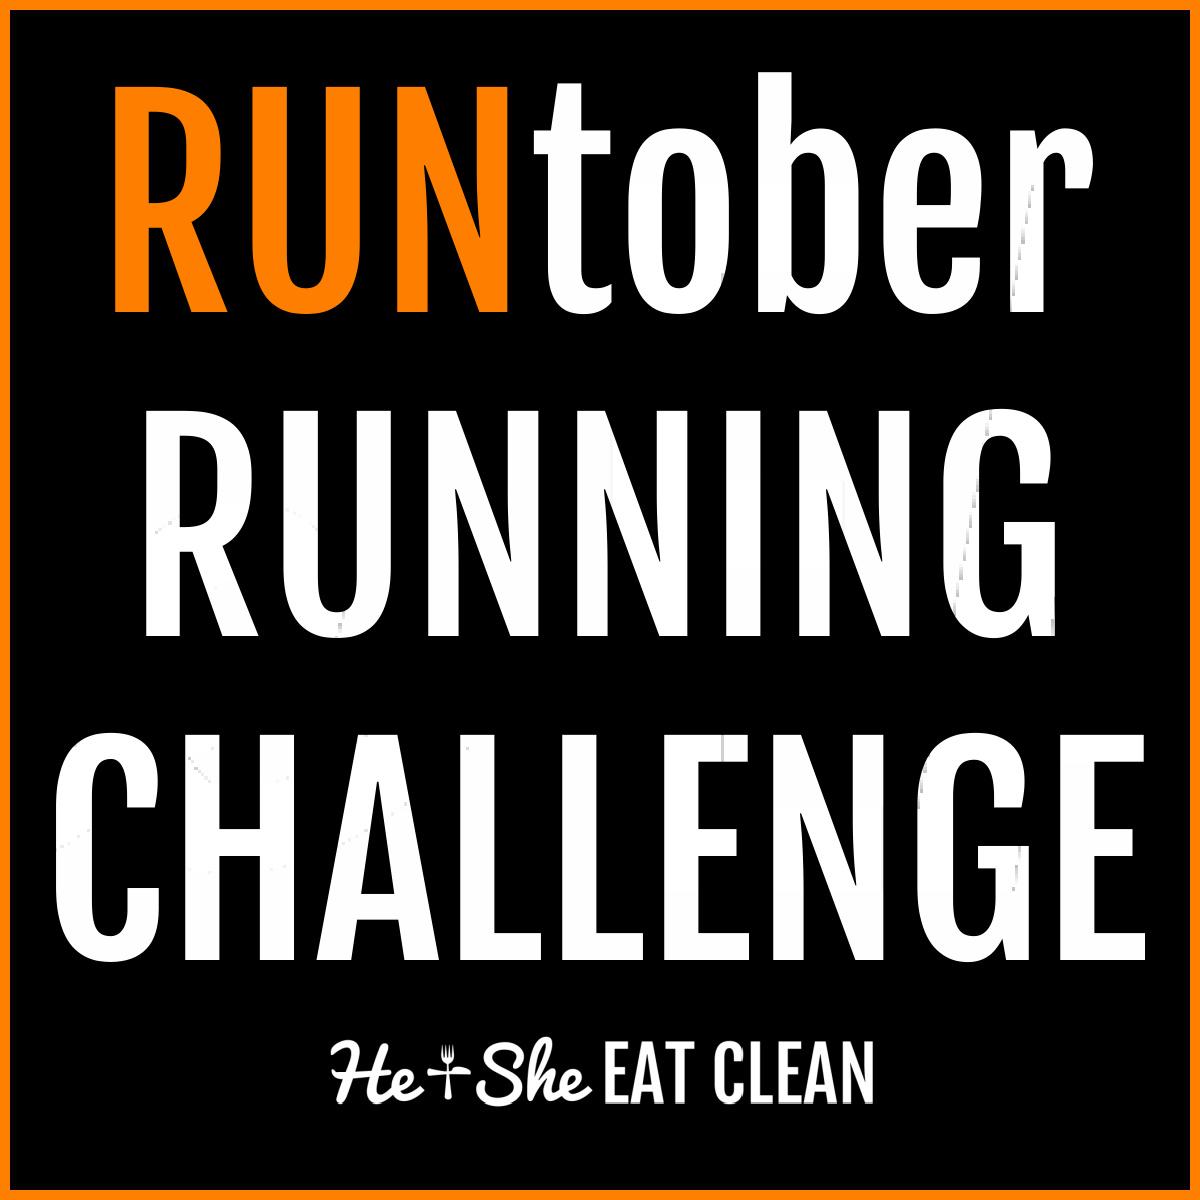 text reads RUNtober Running Challenge